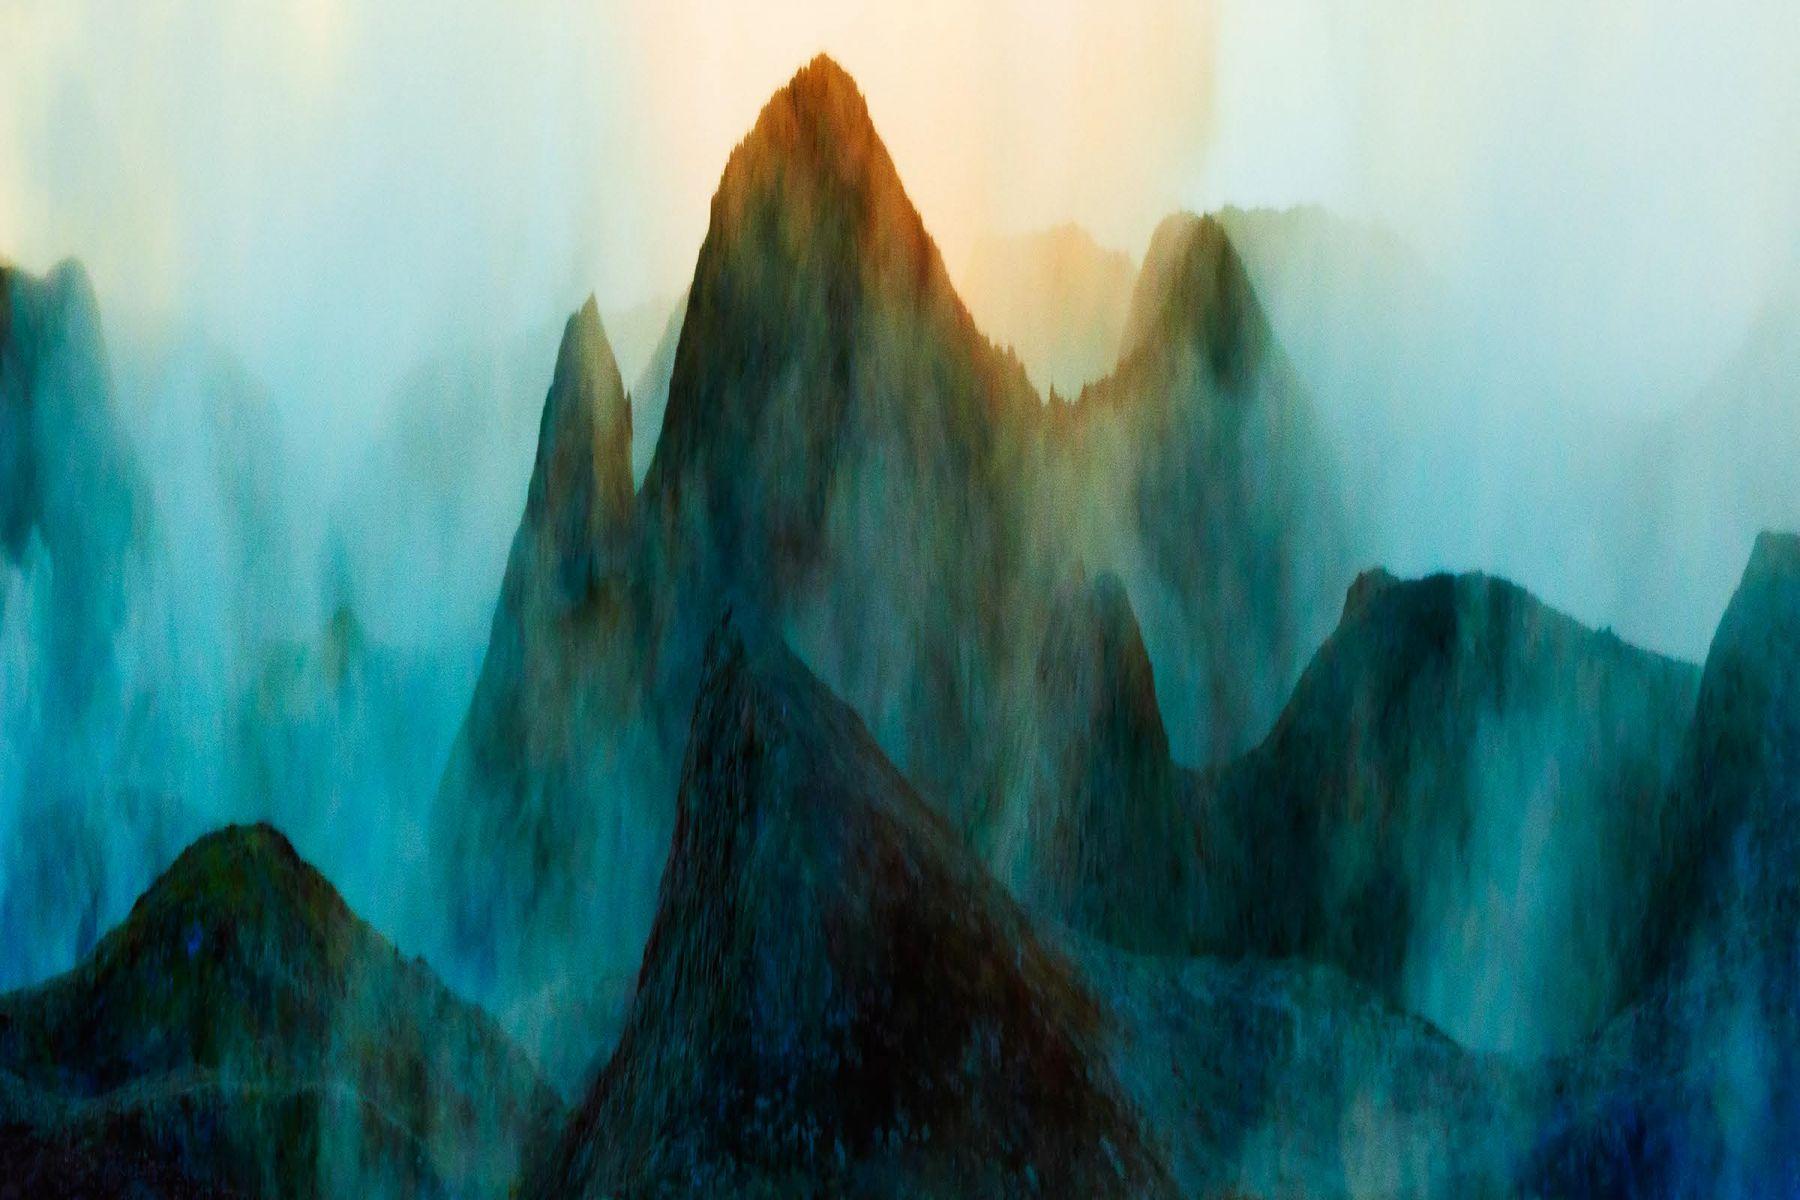 Inhale, Exhale, Repeat, Fuji Flex Crystal Archive Print, Ed. 5